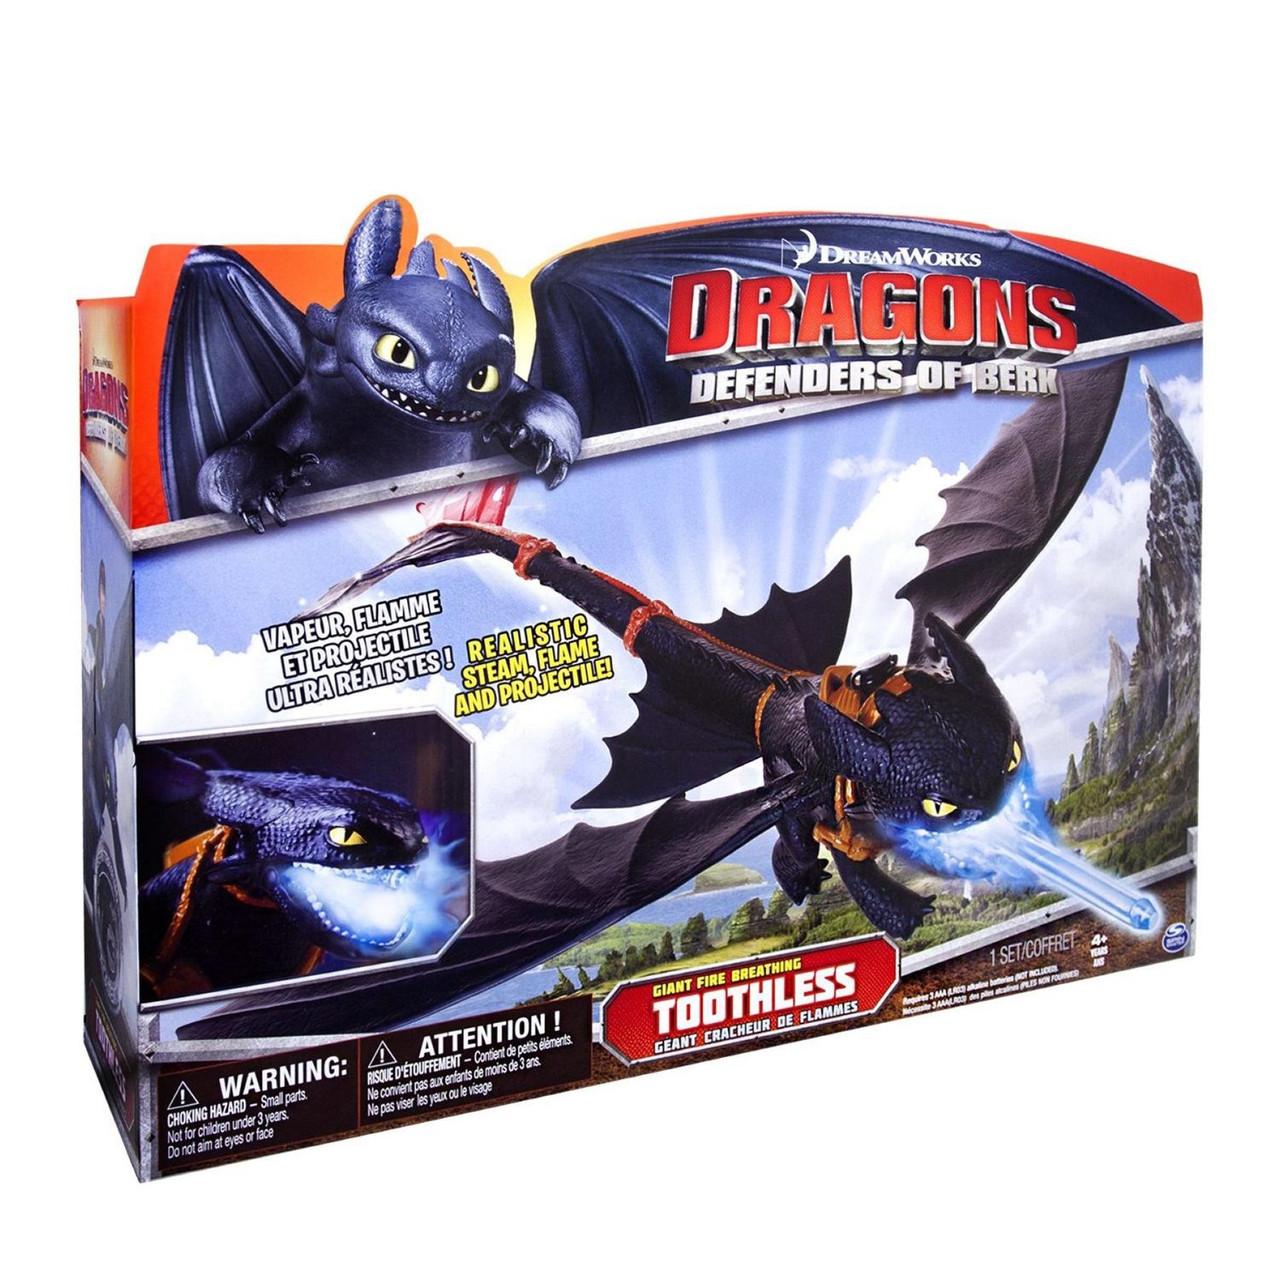 Дракон Беззубик Ночная фурия DreamWorks Dragons (Spin Master США) -  Интернет- магазин